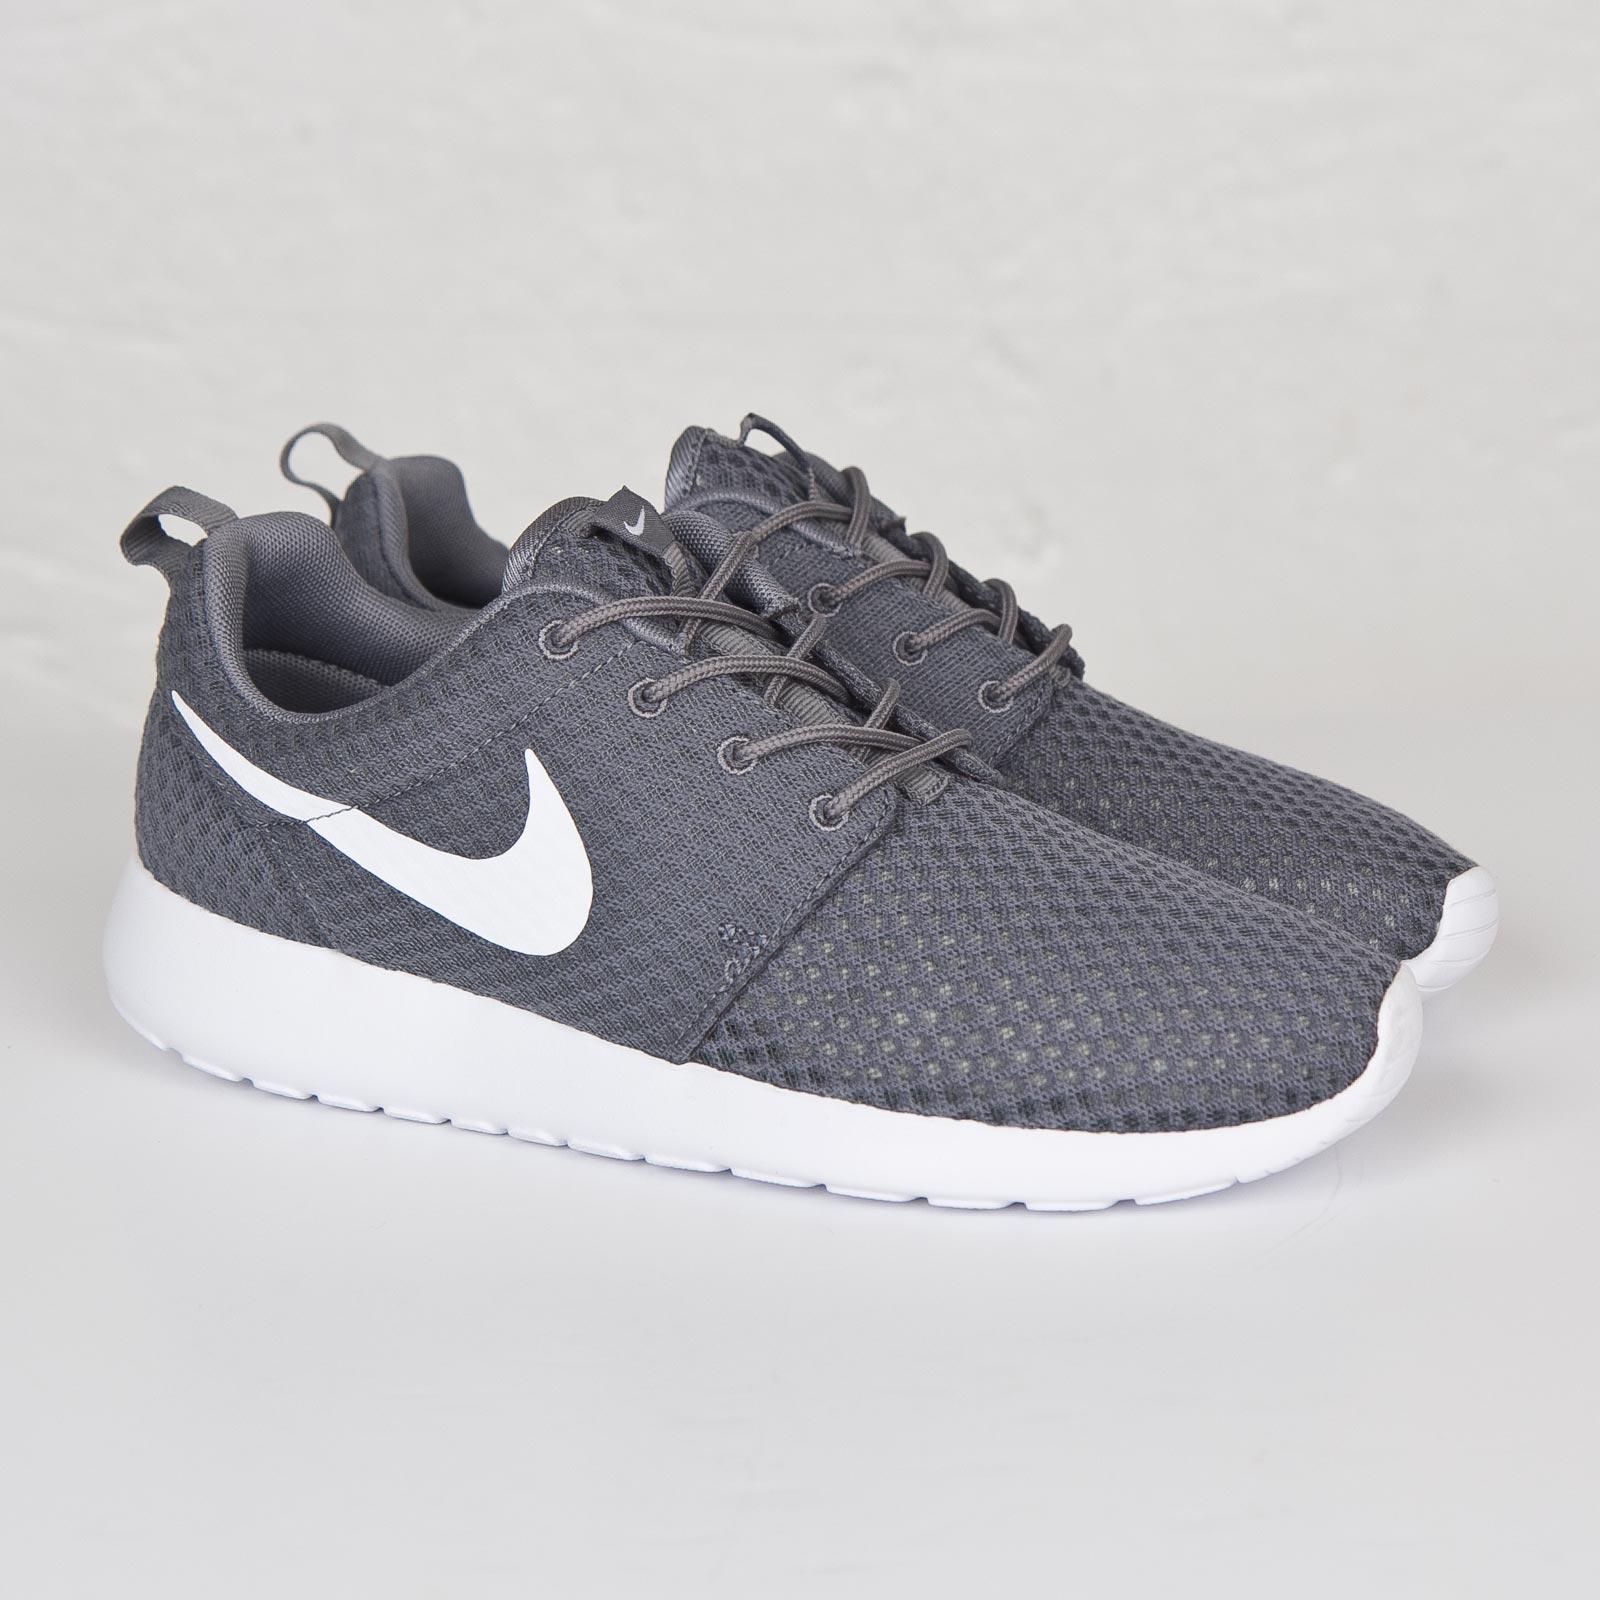 best website c0cc5 2cb2f Nike Roshe Run Breeze